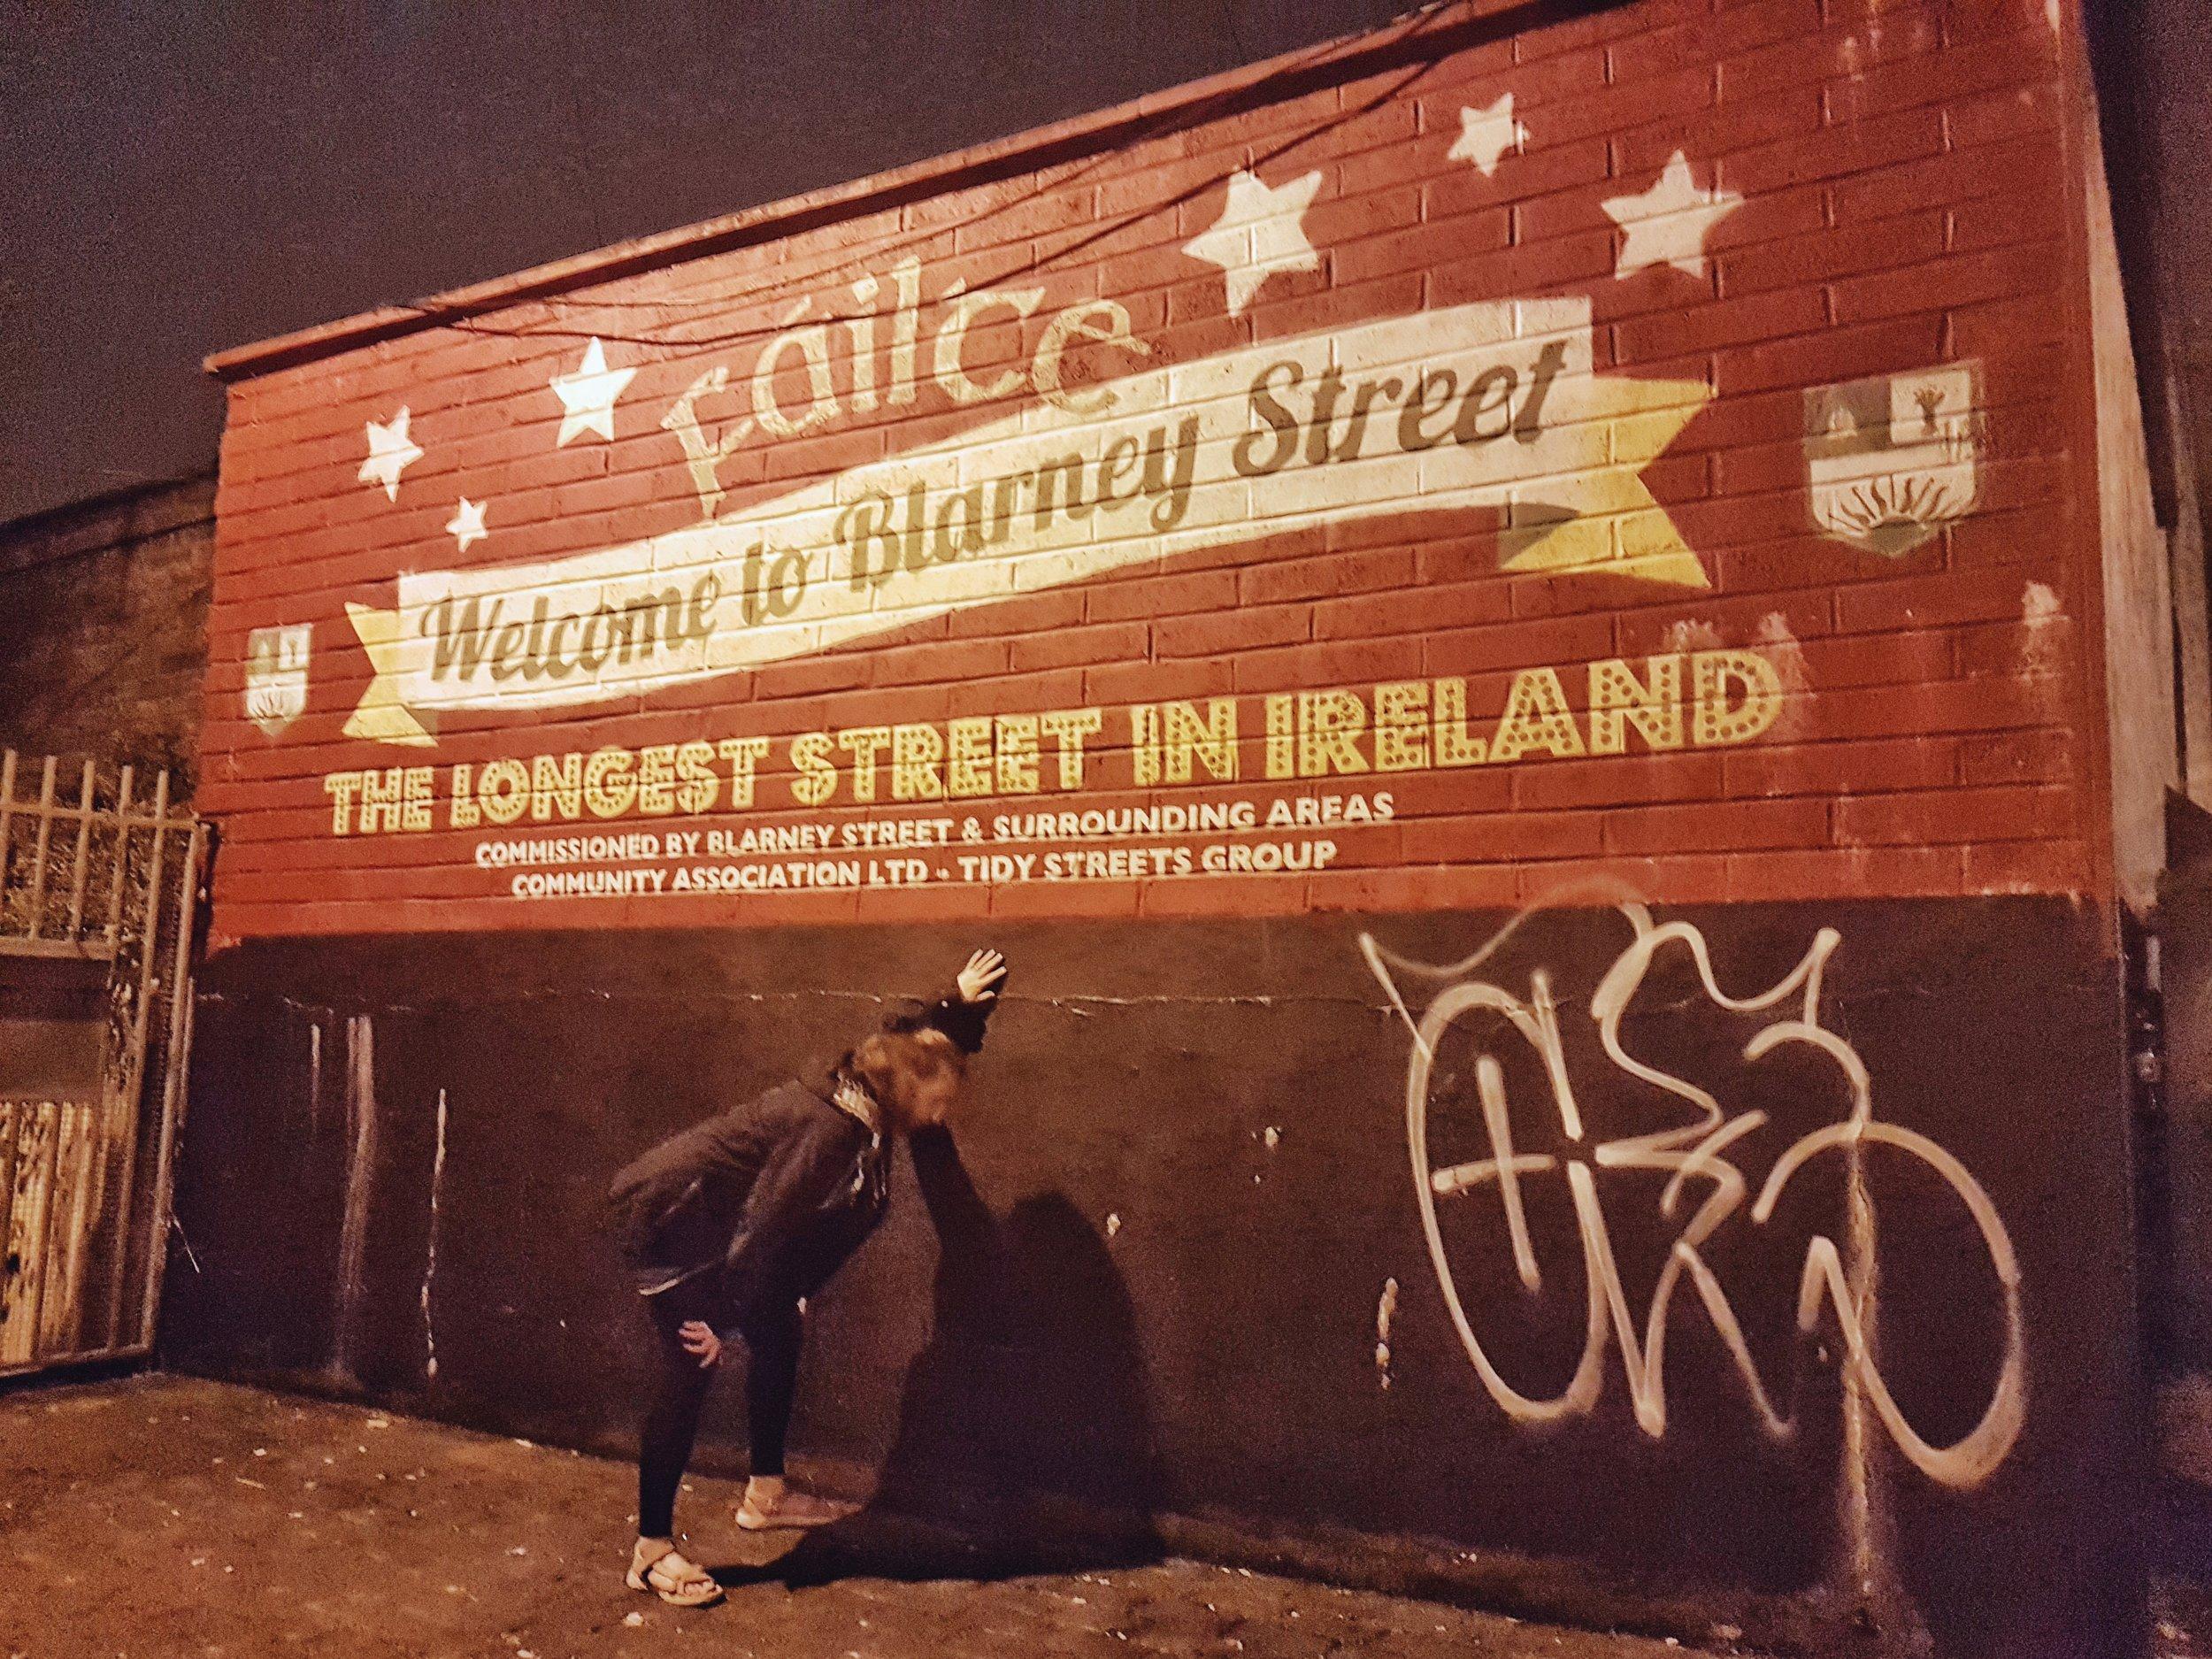 county cork. cork. ireland. irish. history. city. house sitting. old. travel. travel photography. travel photographer.  longest street in Ireland. wrecked from the walking.jpg